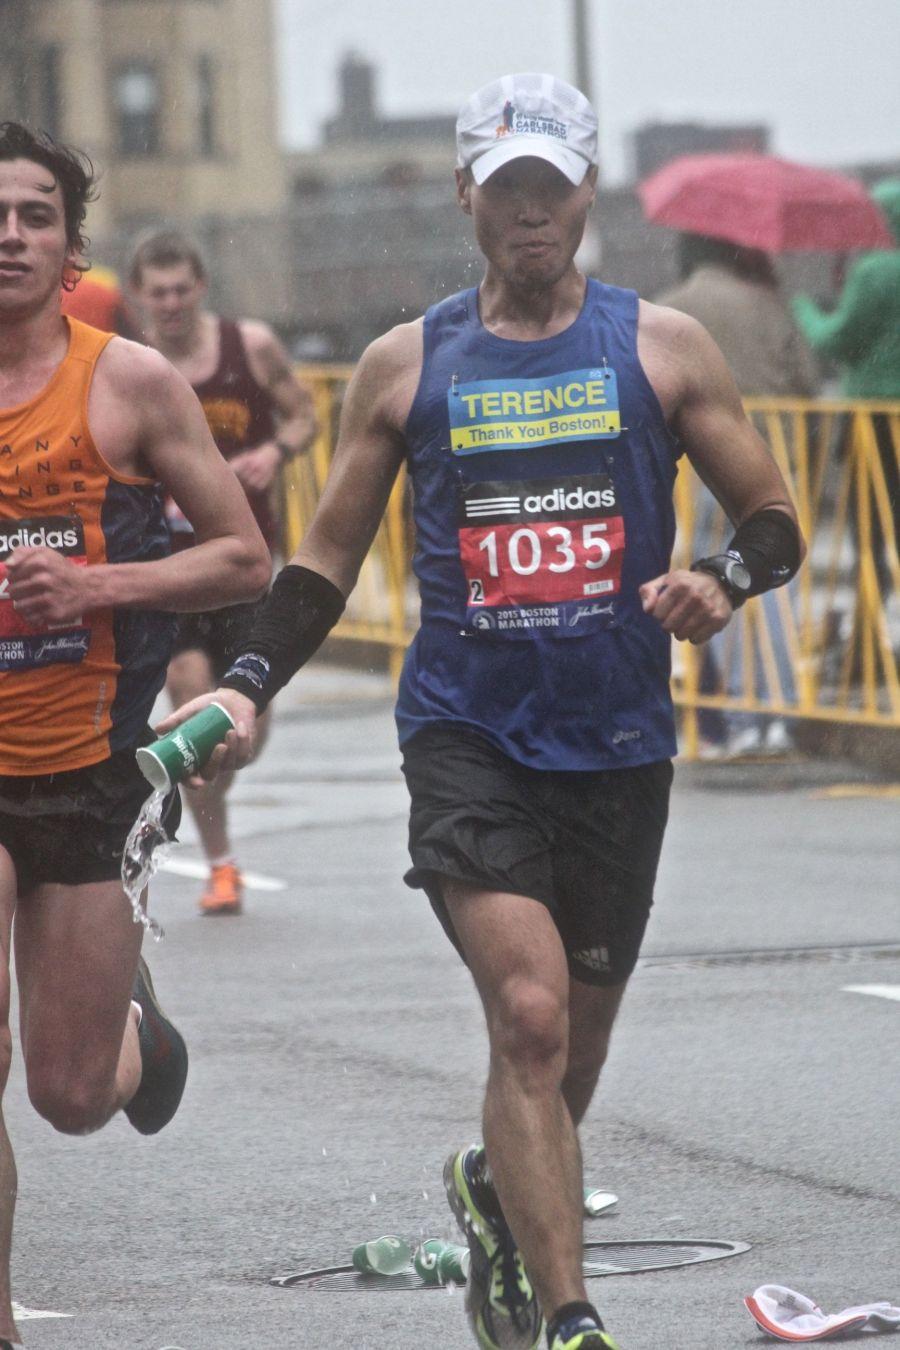 boston marathon april 20 2015 racer number 1035